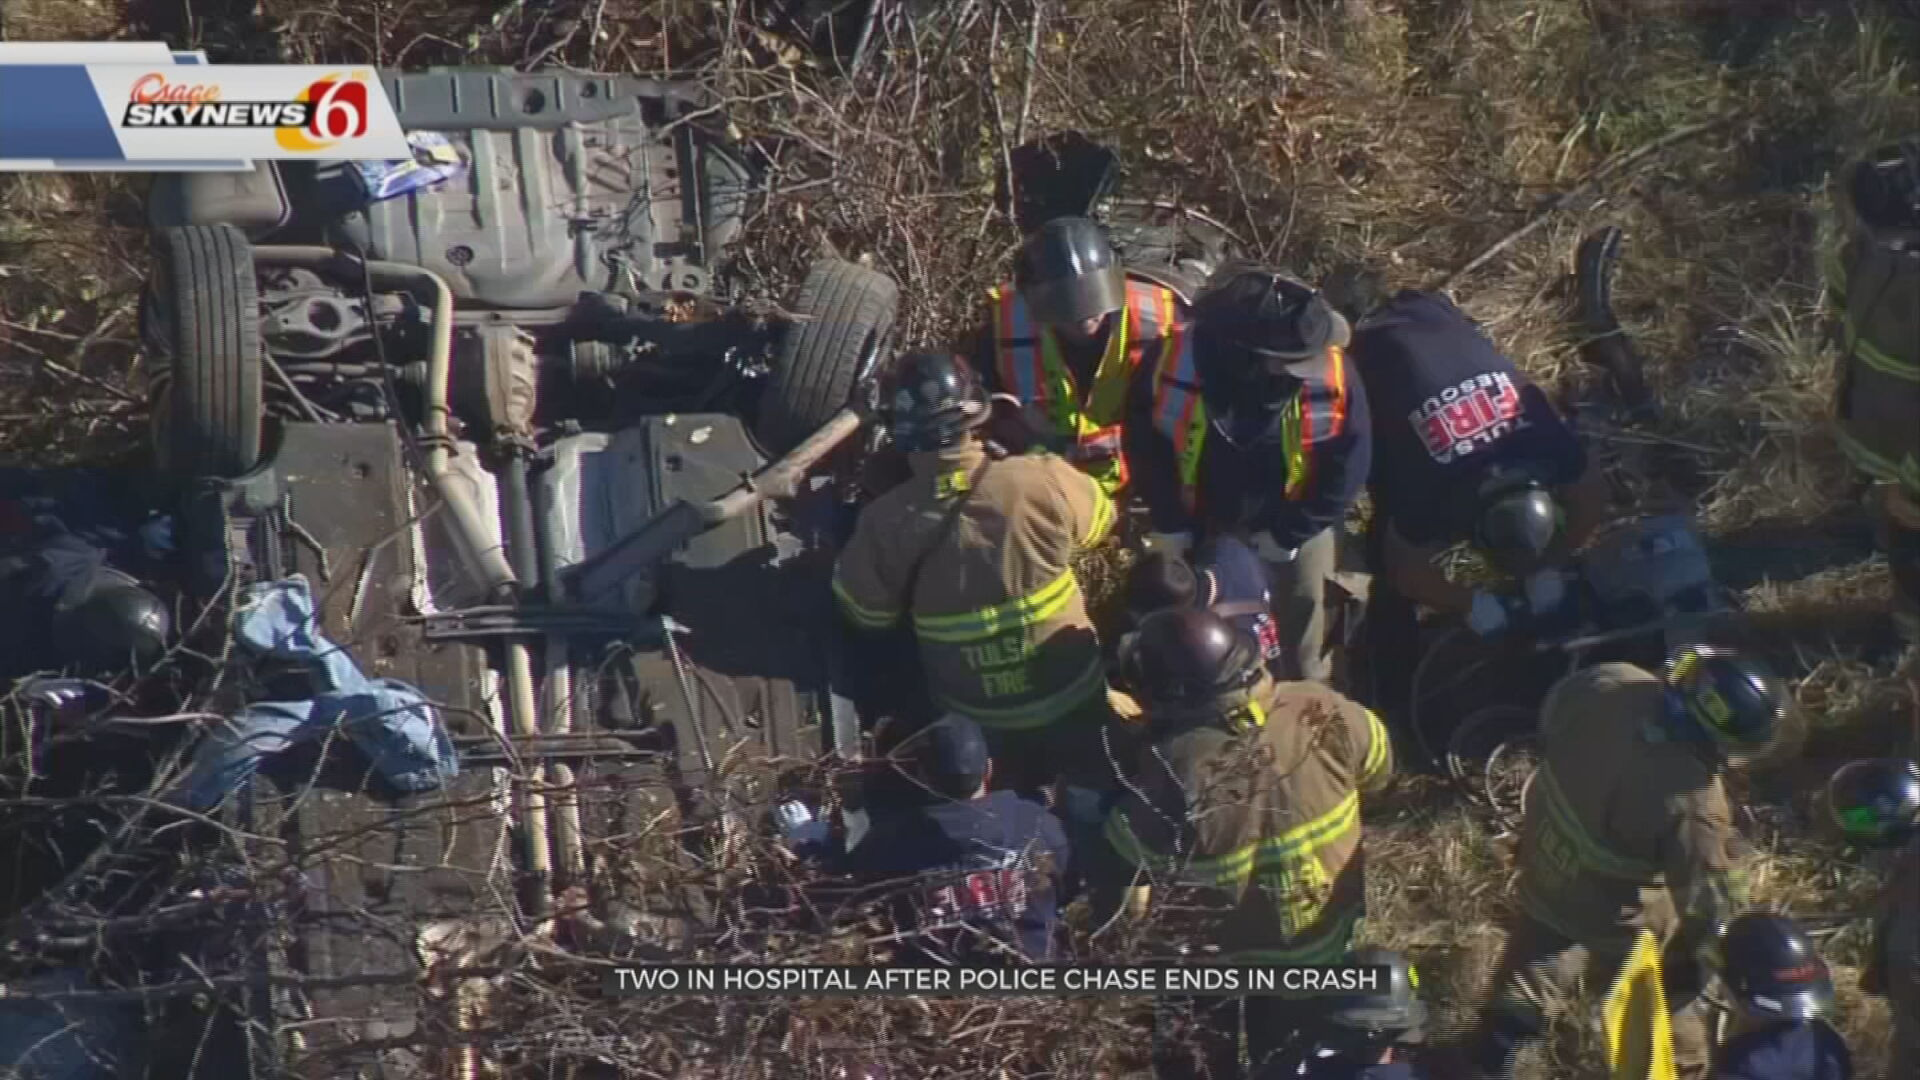 2 Taken To Hospital After Tulsa Police Chase Ends In Crash